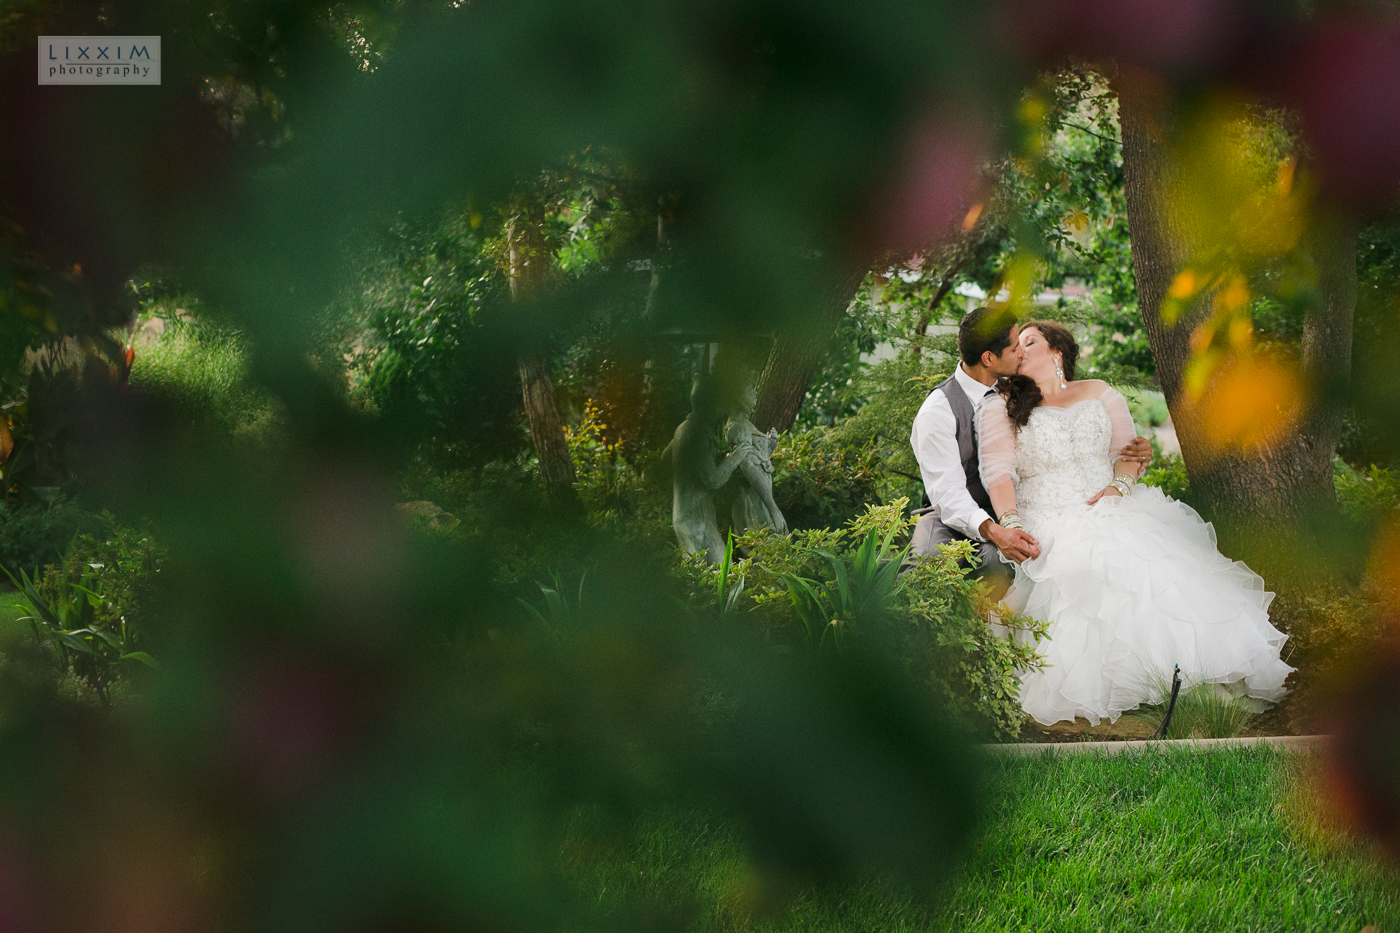 willow-creek-events-wedding-lixxim-photography-marysville-sacramento-photogarpher